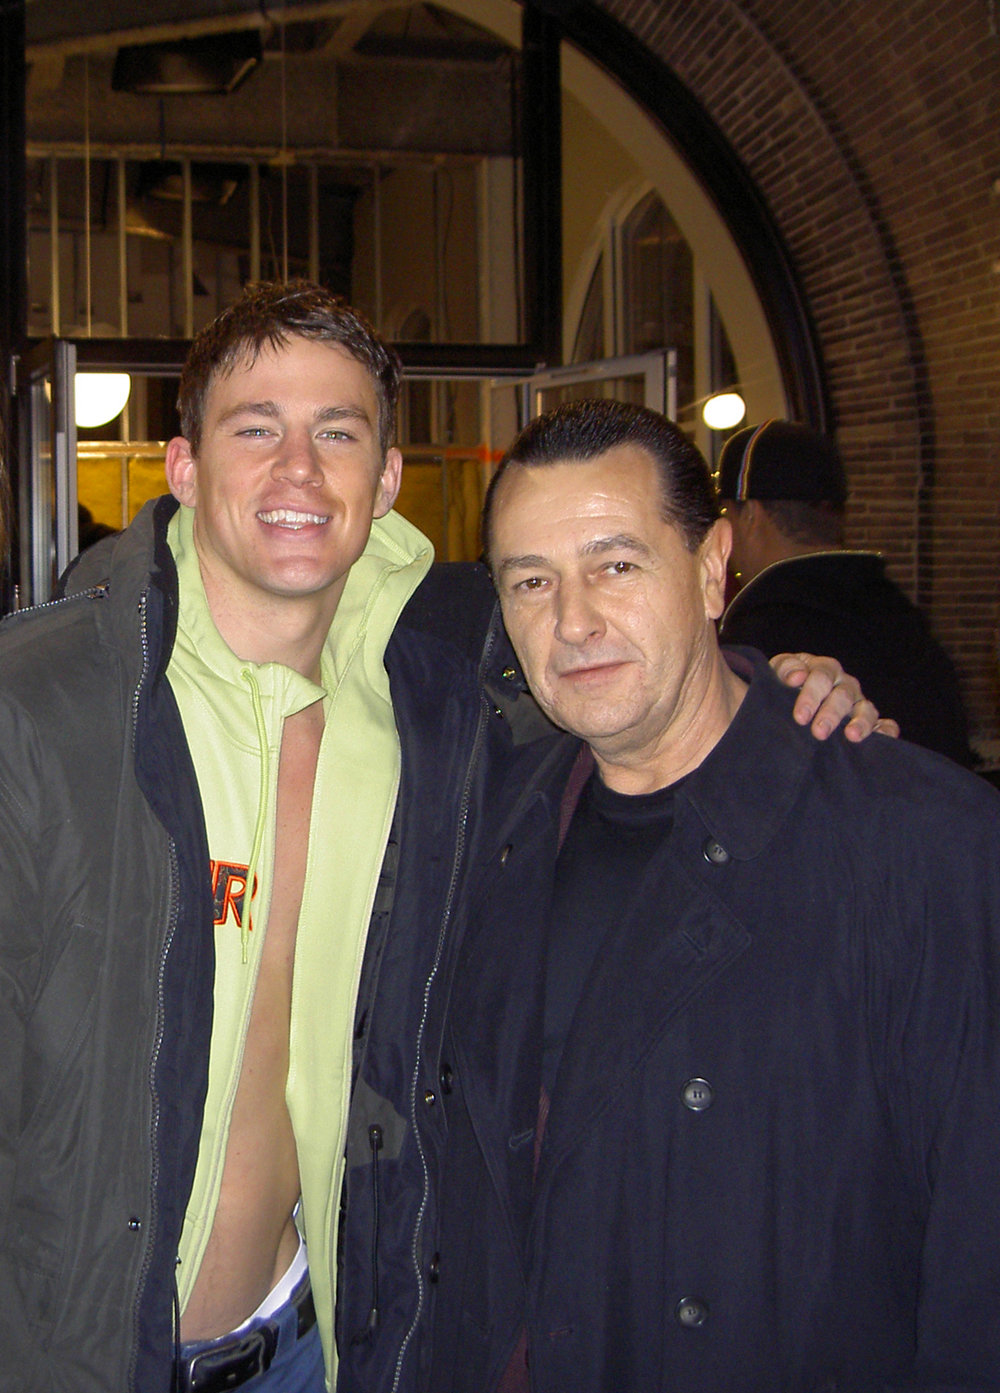 Channing Tatum and Vladimir Nazarov